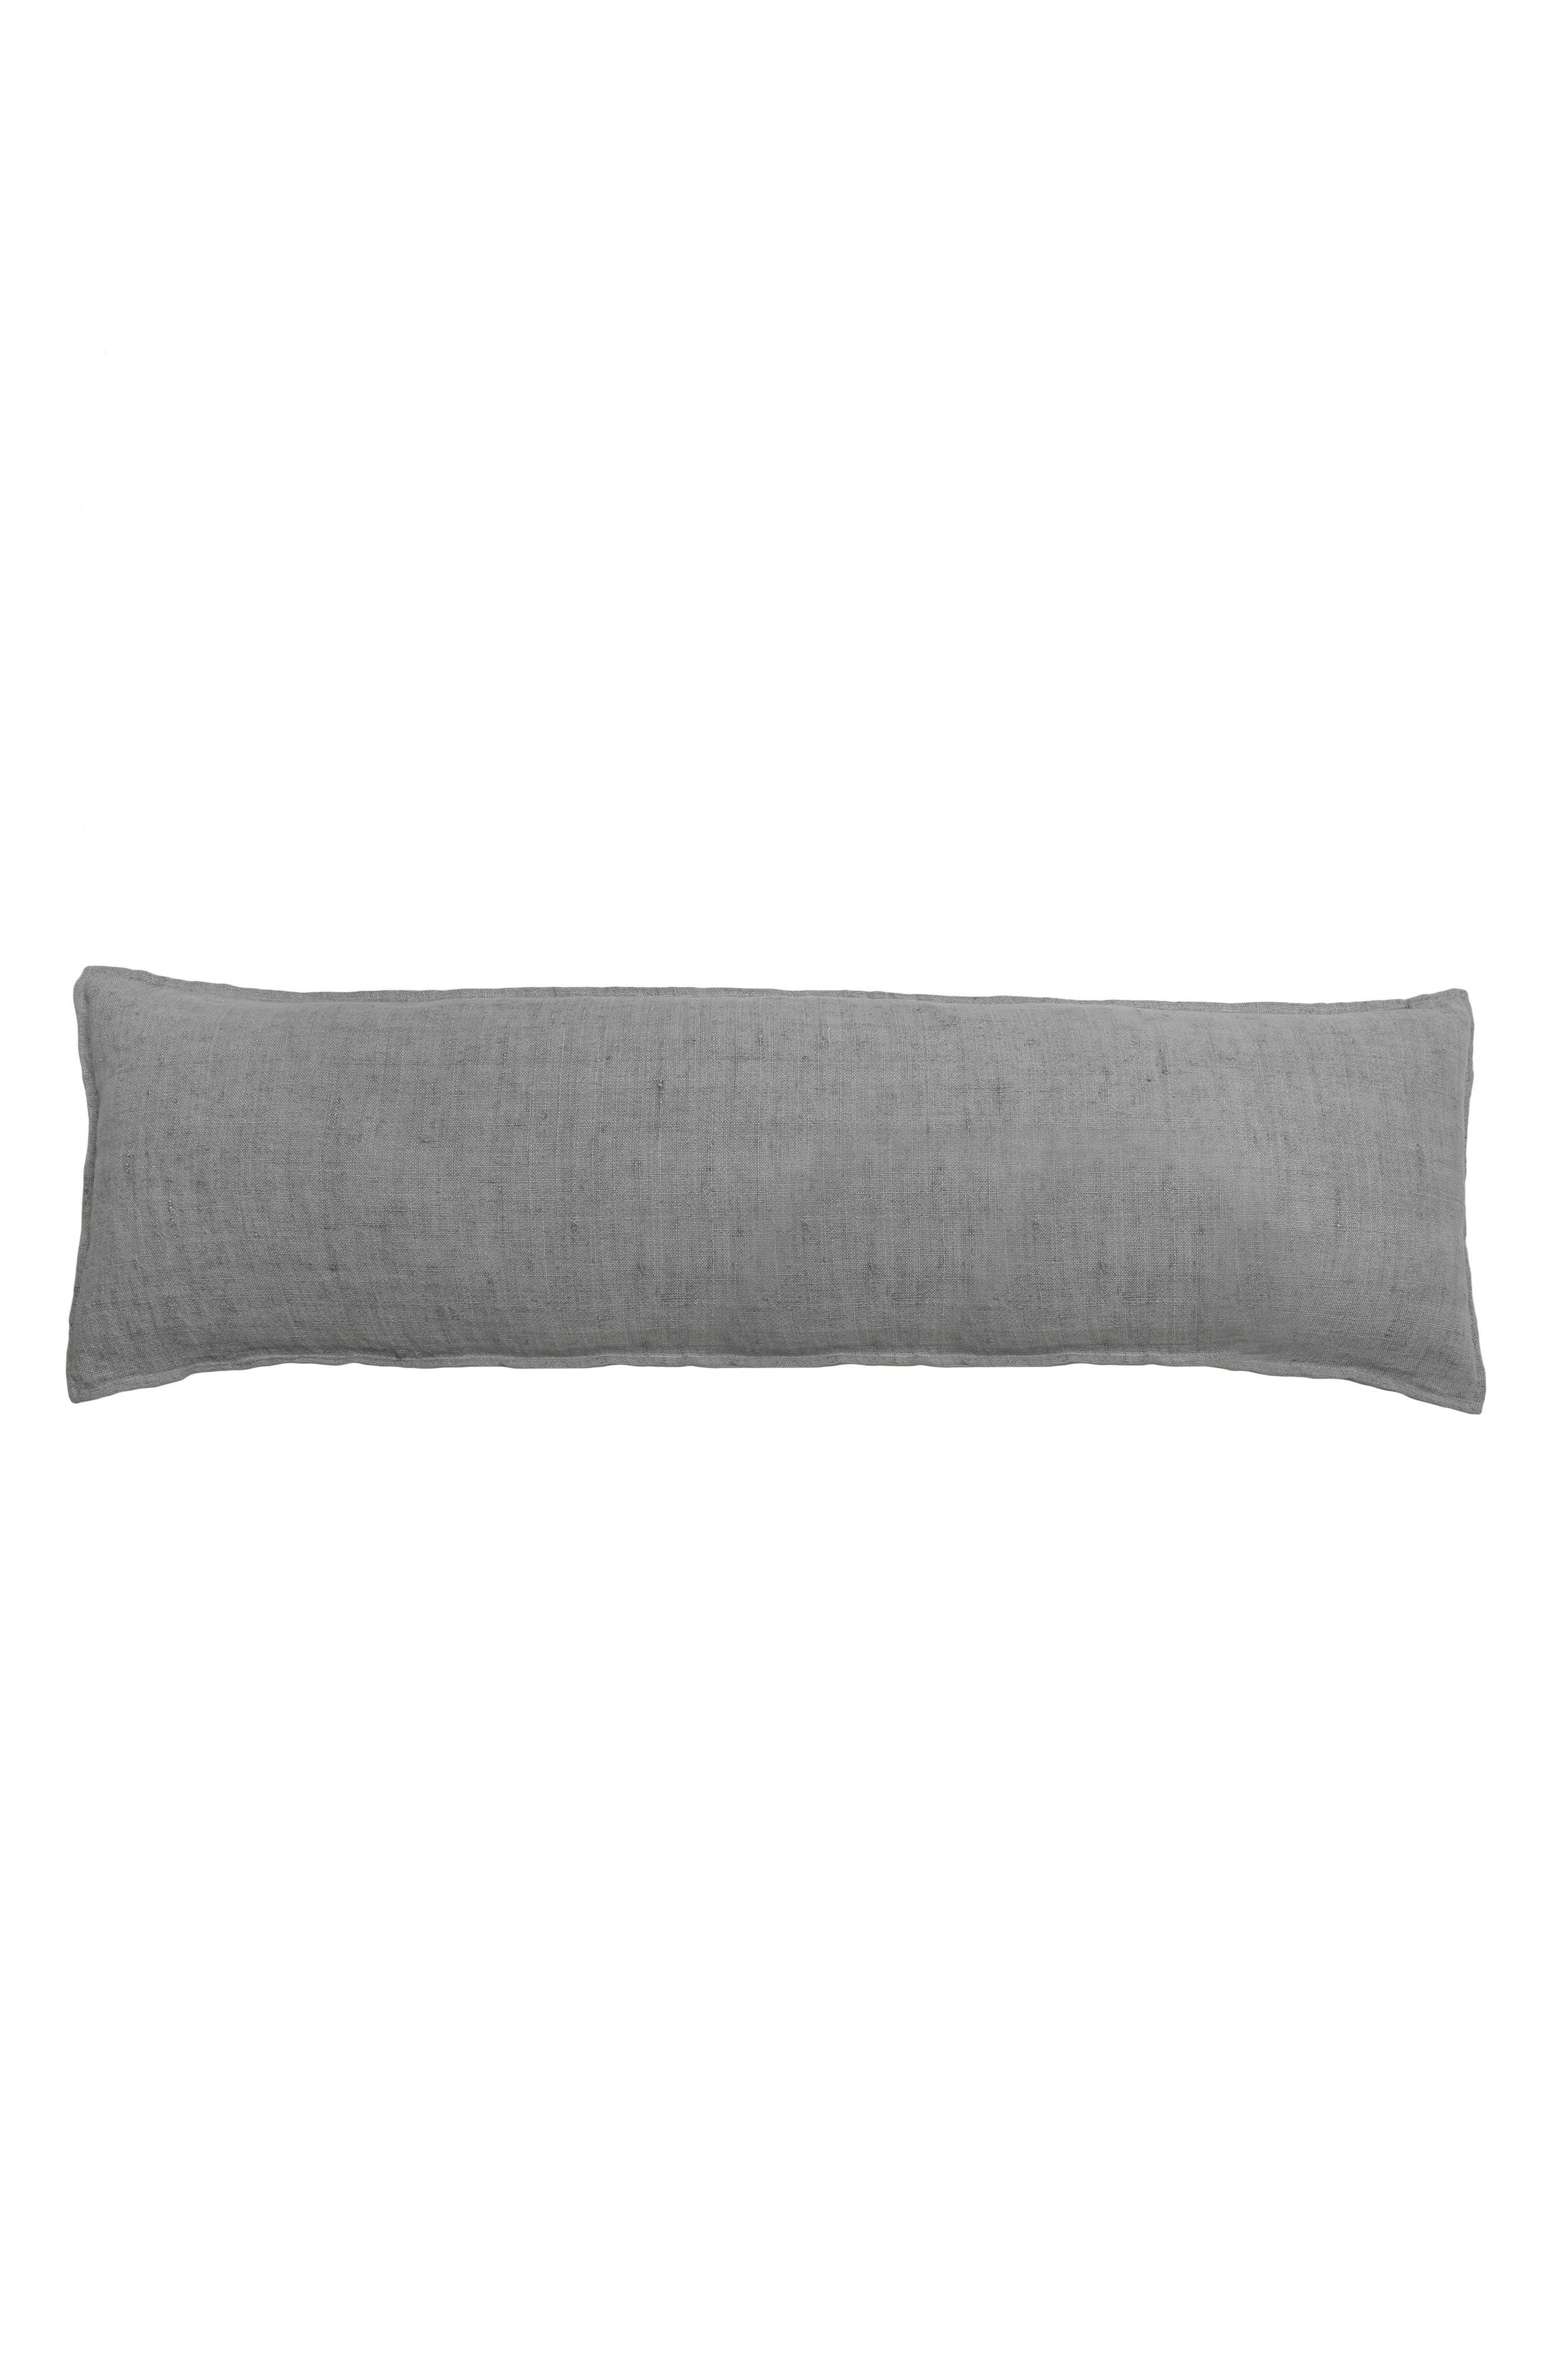 Alternate Image 1 Selected - Pom Pom at Home Montauk Body Pillow